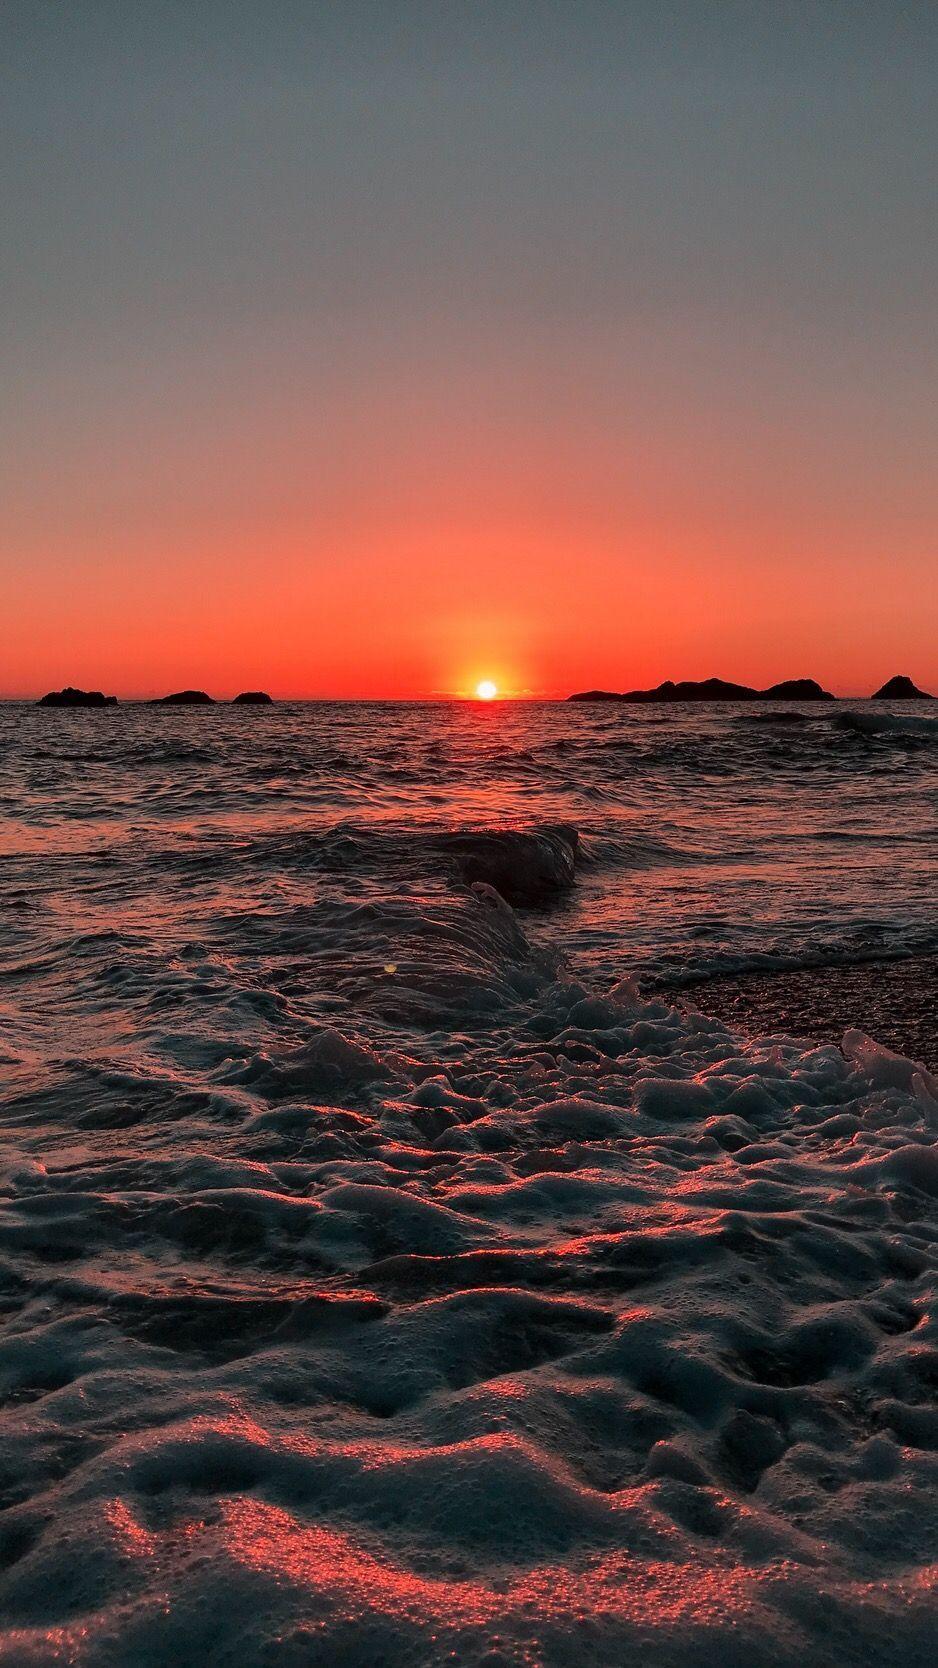 Lockscreen Aesthetic Iphone Wallpapers In 2020 Sunset Wallpaper Nature Wallpaper Beach Sunset